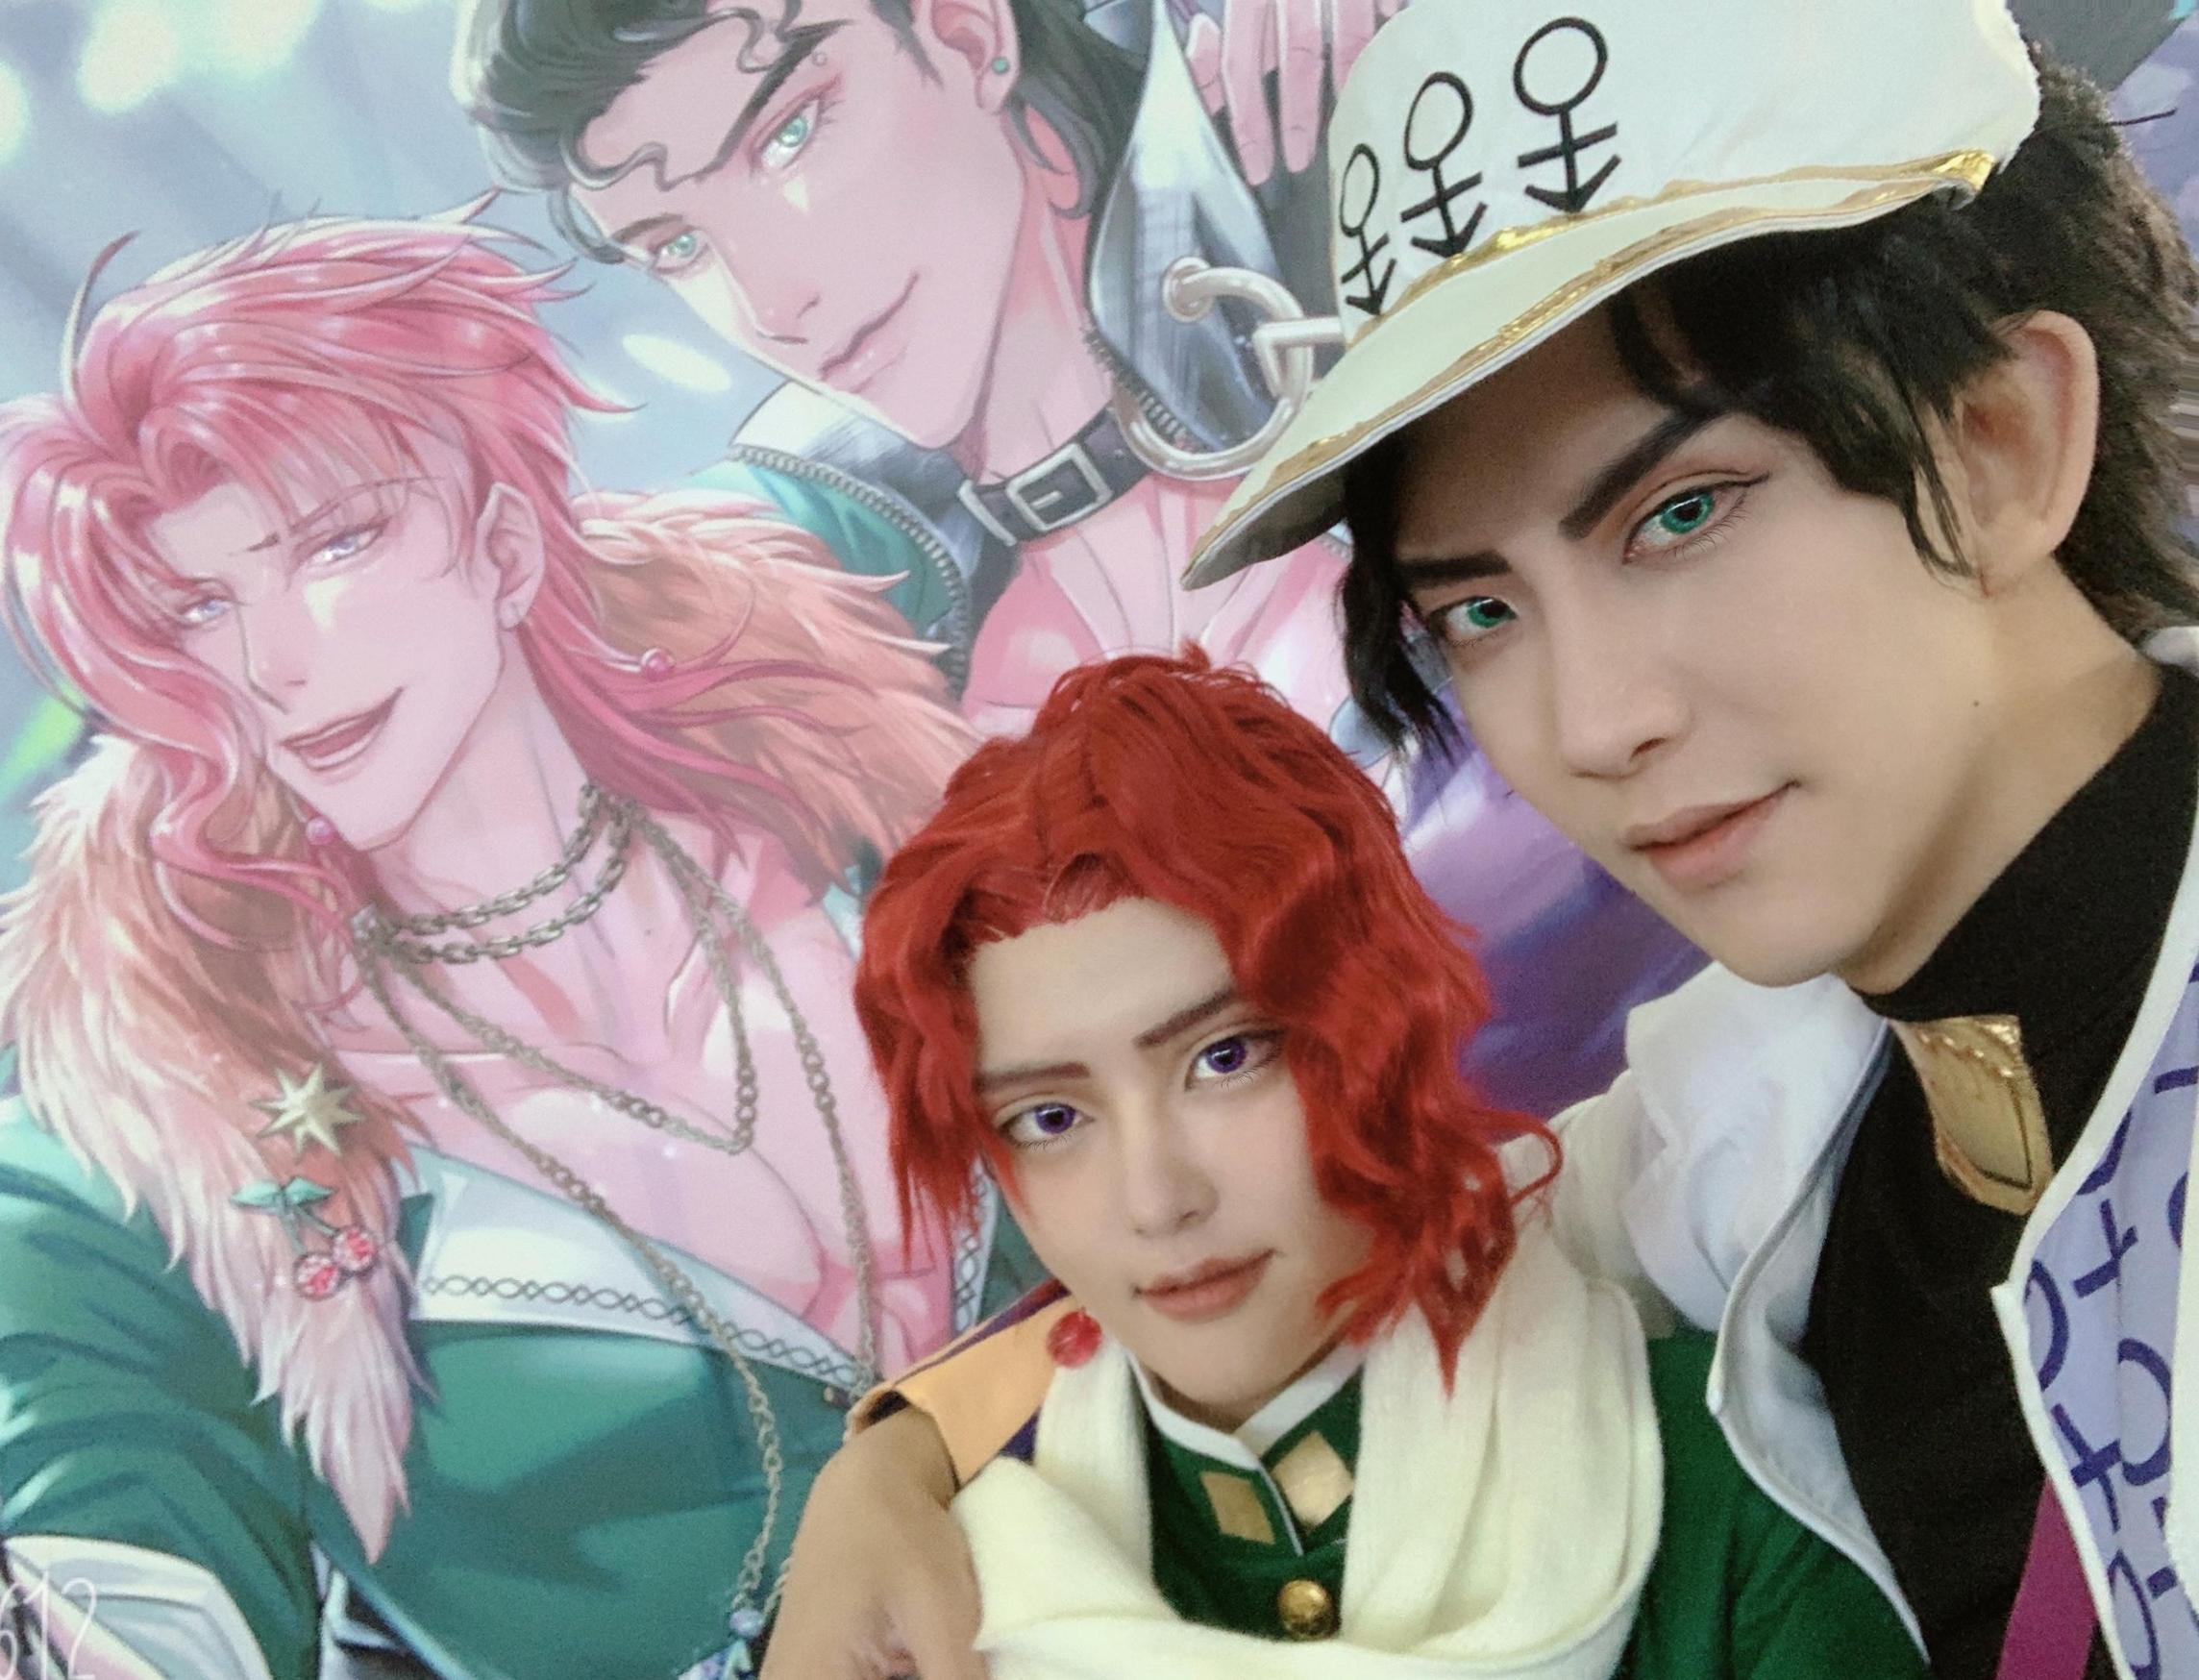 《JOJO的奇妙冒险》东方仗助cosplay【CN:小夕未希_miki】-第4张